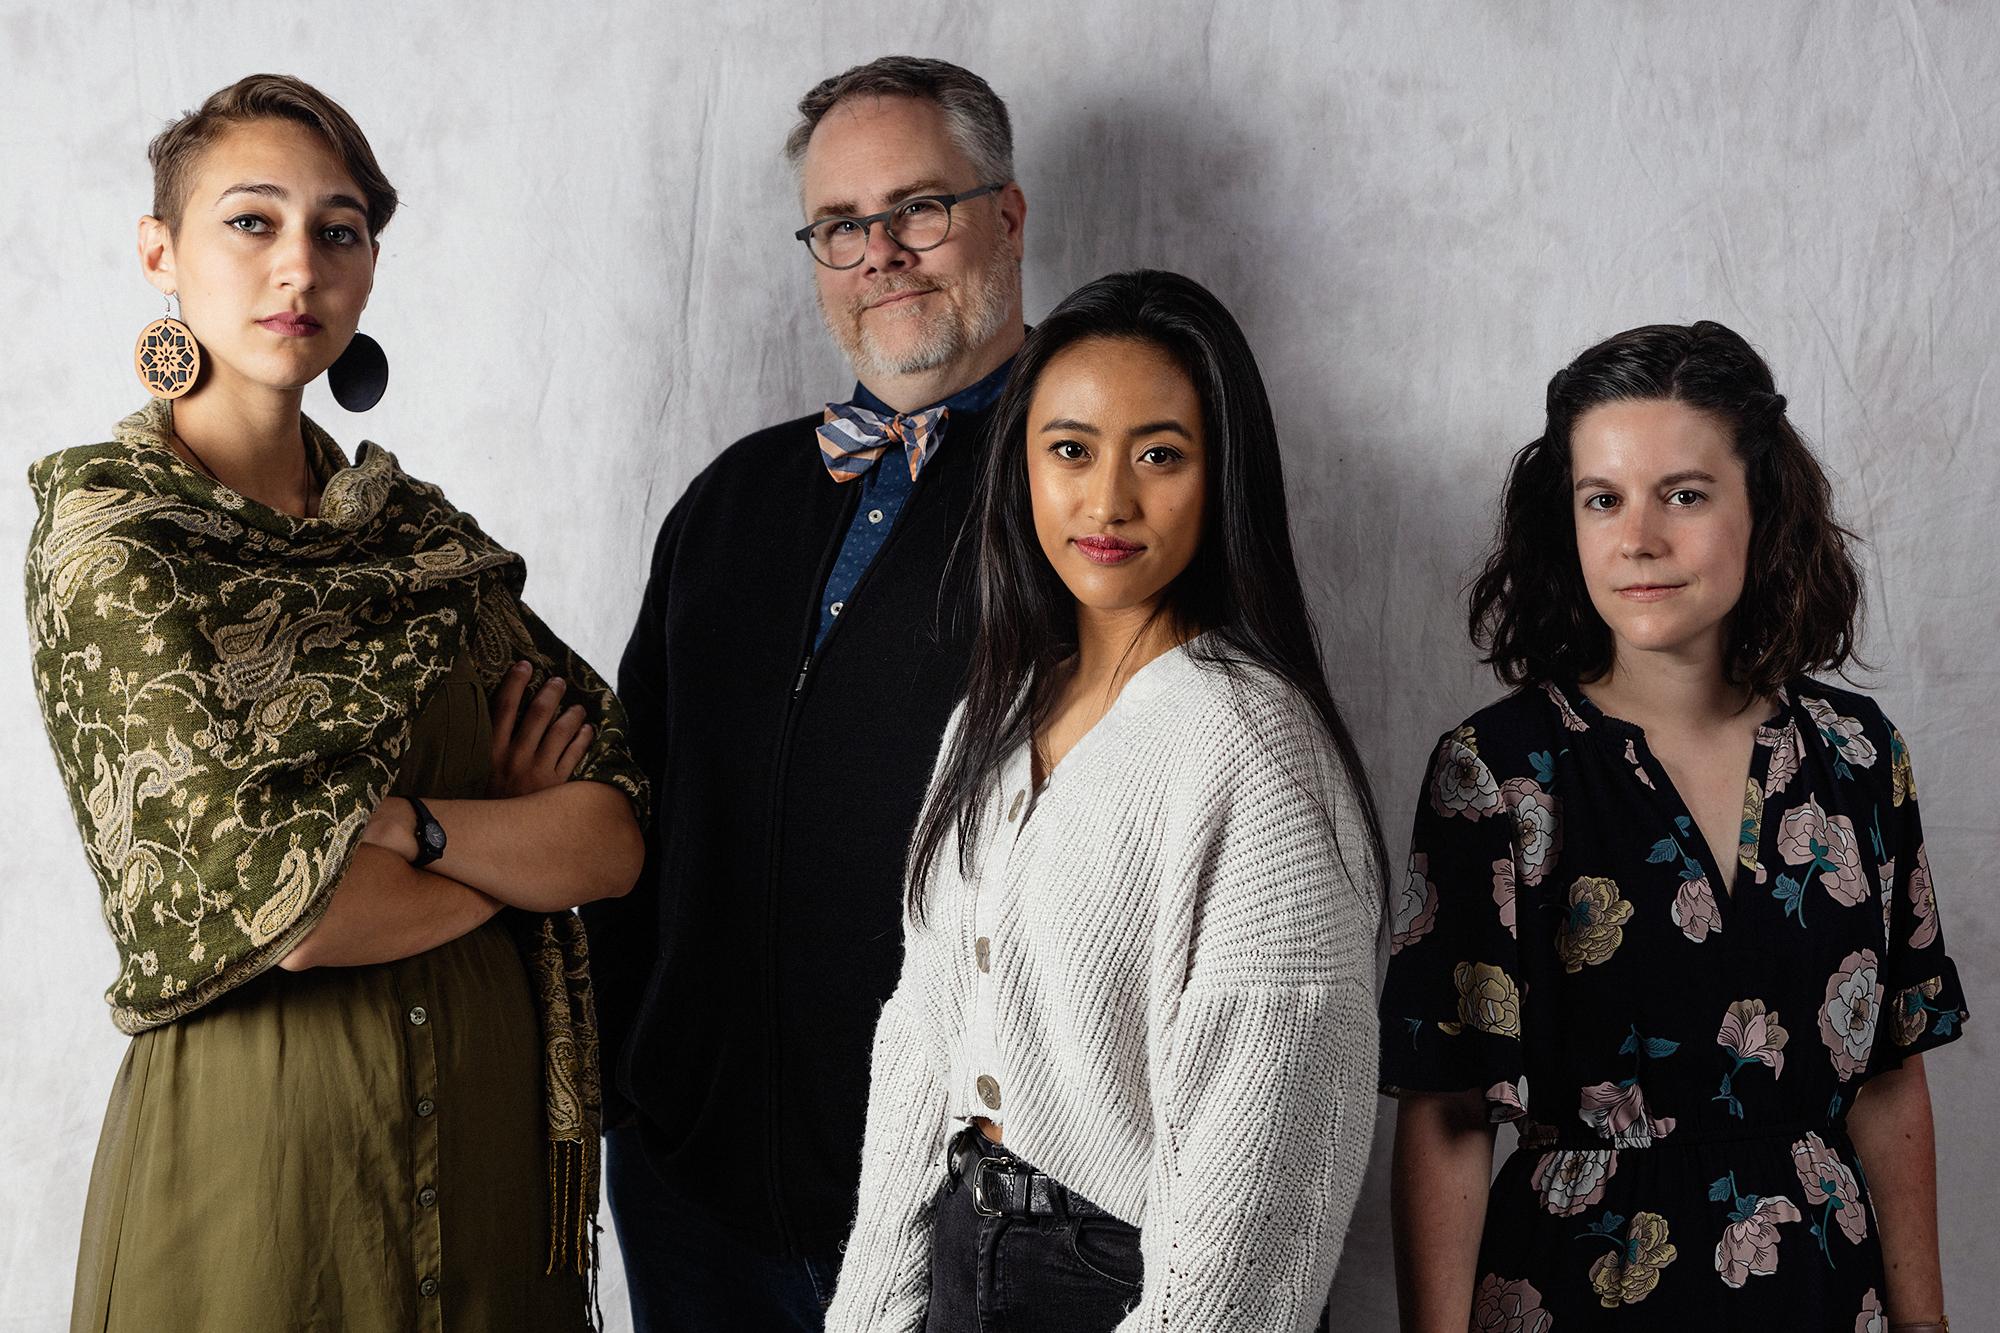 Nabra Nelson, Tom Smith, Rheanna Atendido & Danielle Mohlman | Not Pictured: Mona Sherif-Nelson & Courtney Meaker |  Photo by Brett Love